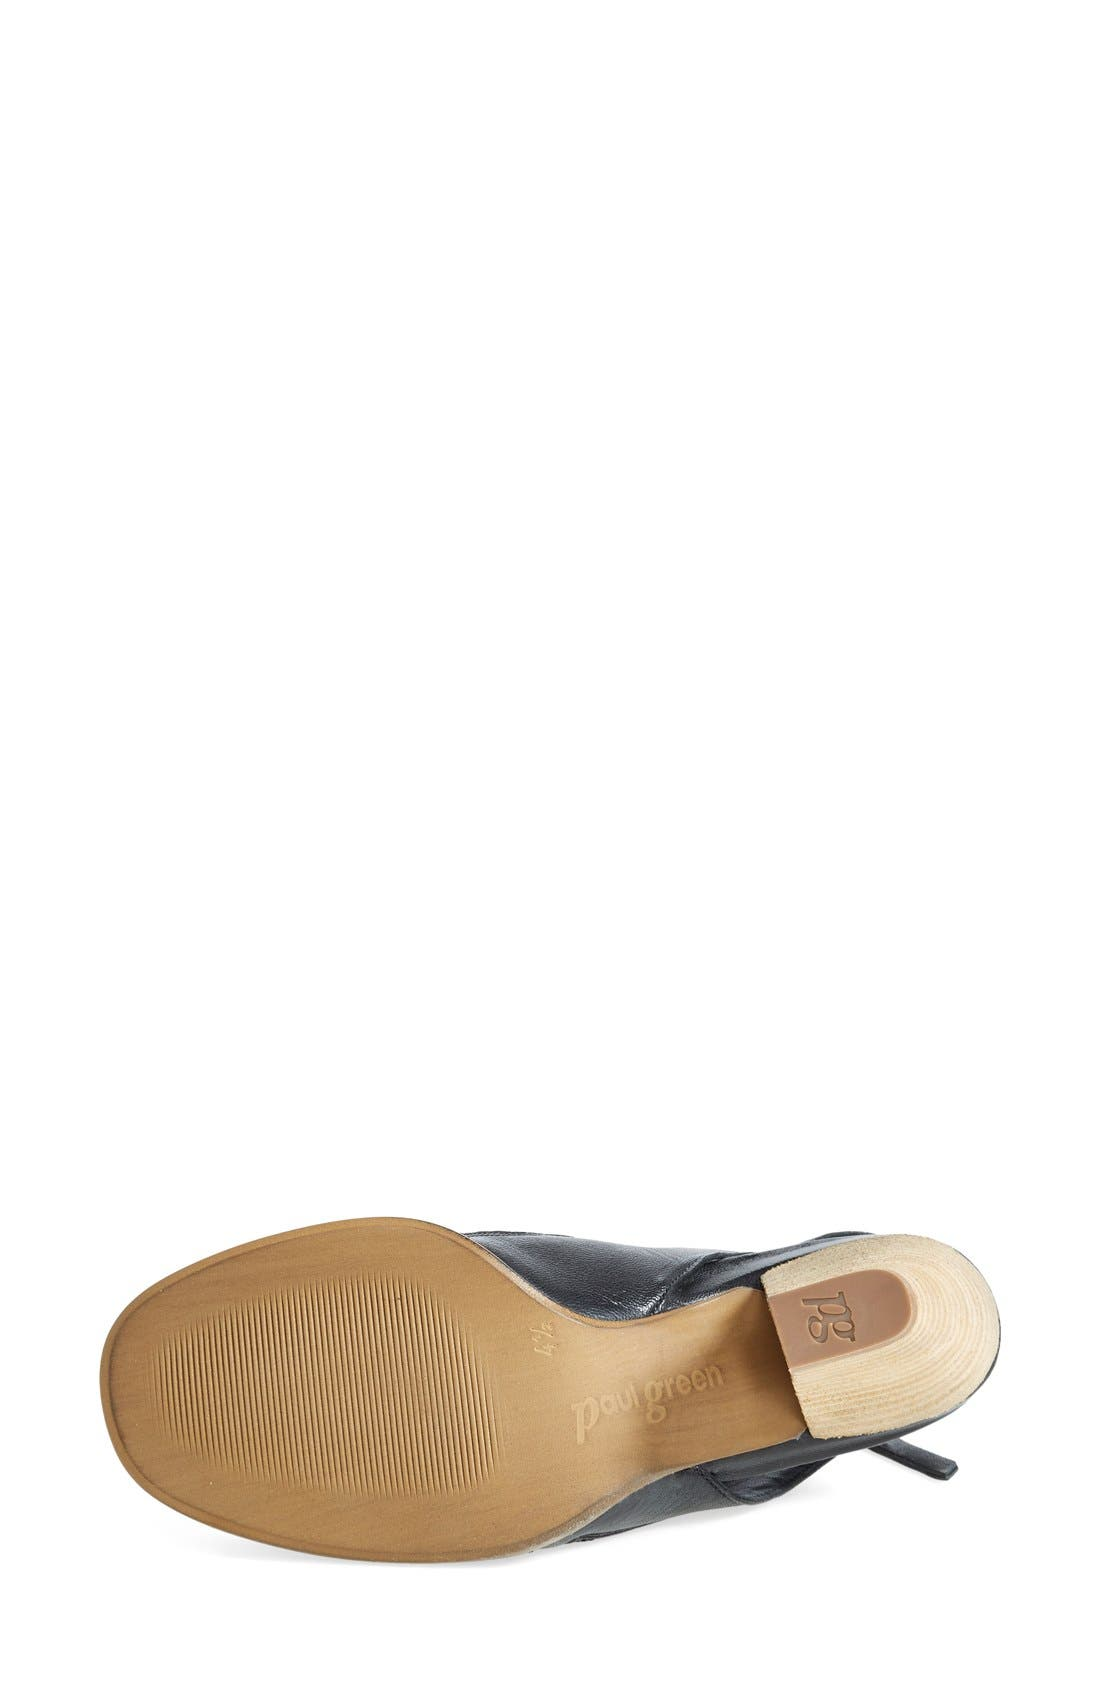 'Cayanne' Leather Peep Toe Sandal,                             Alternate thumbnail 14, color,